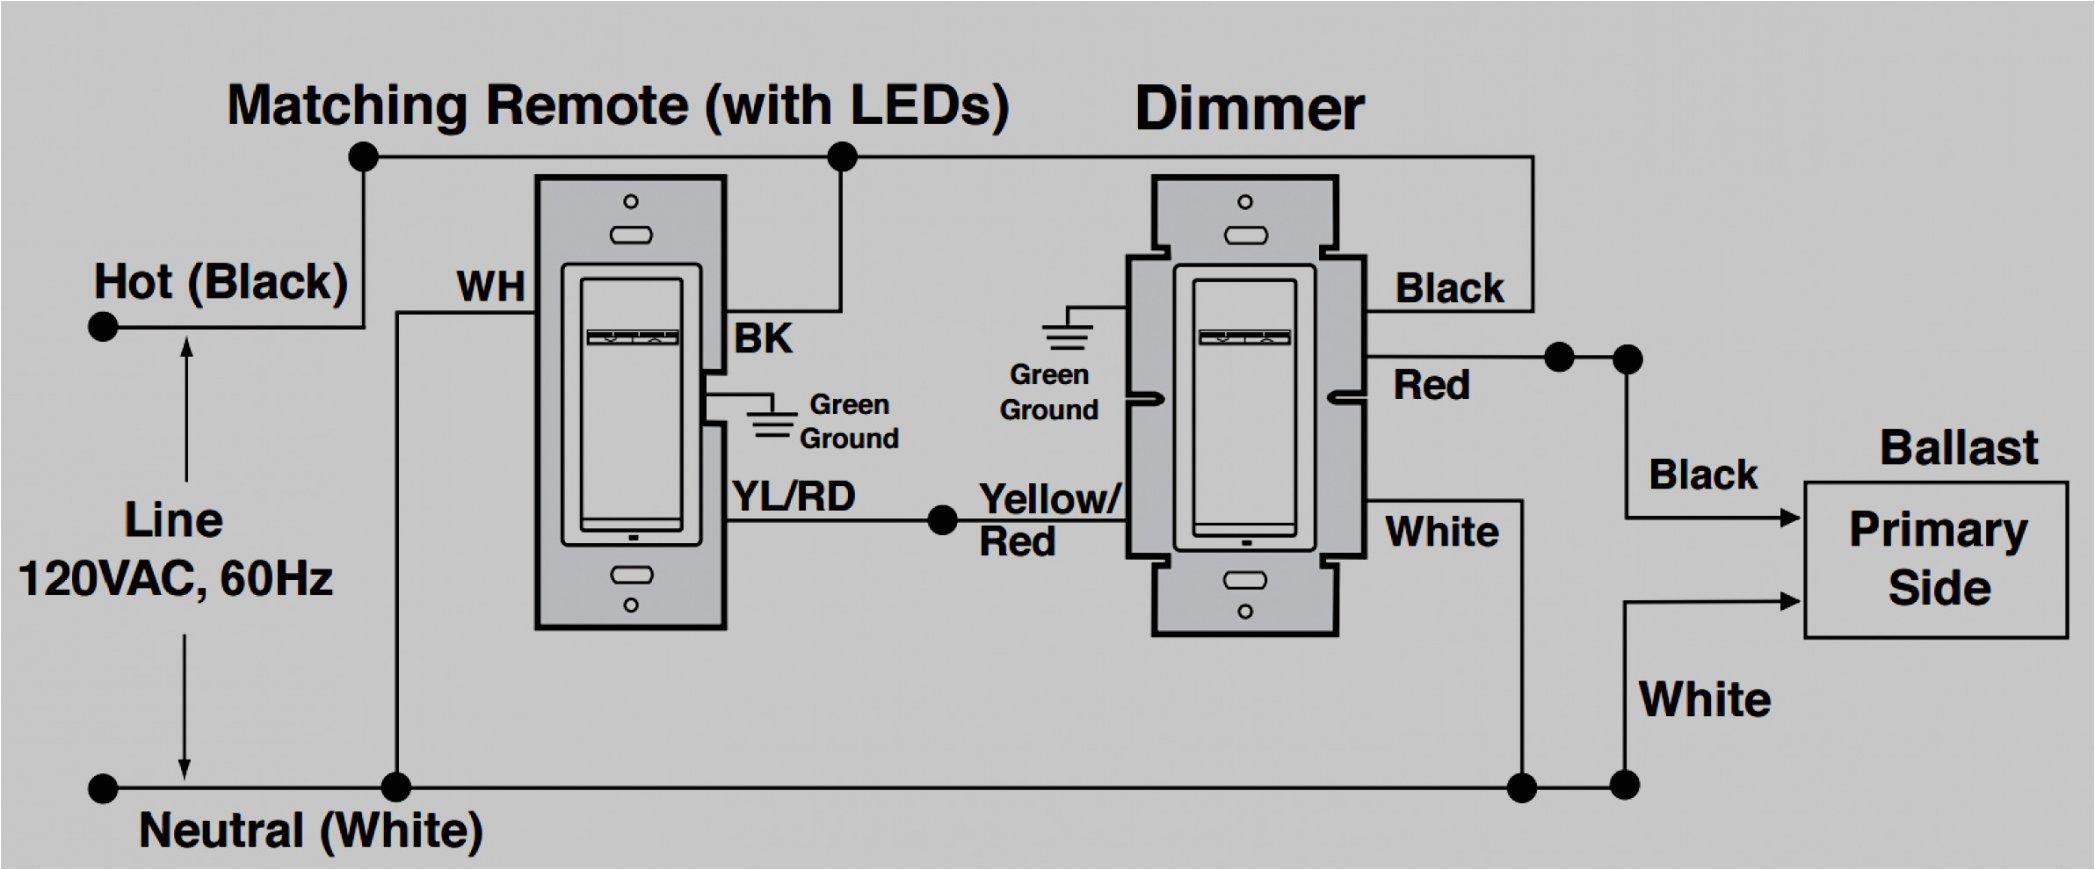 lutron 3 way dimmer wiring diagram wiring diagram name3 way wiring diagram lutron wiring diagram show